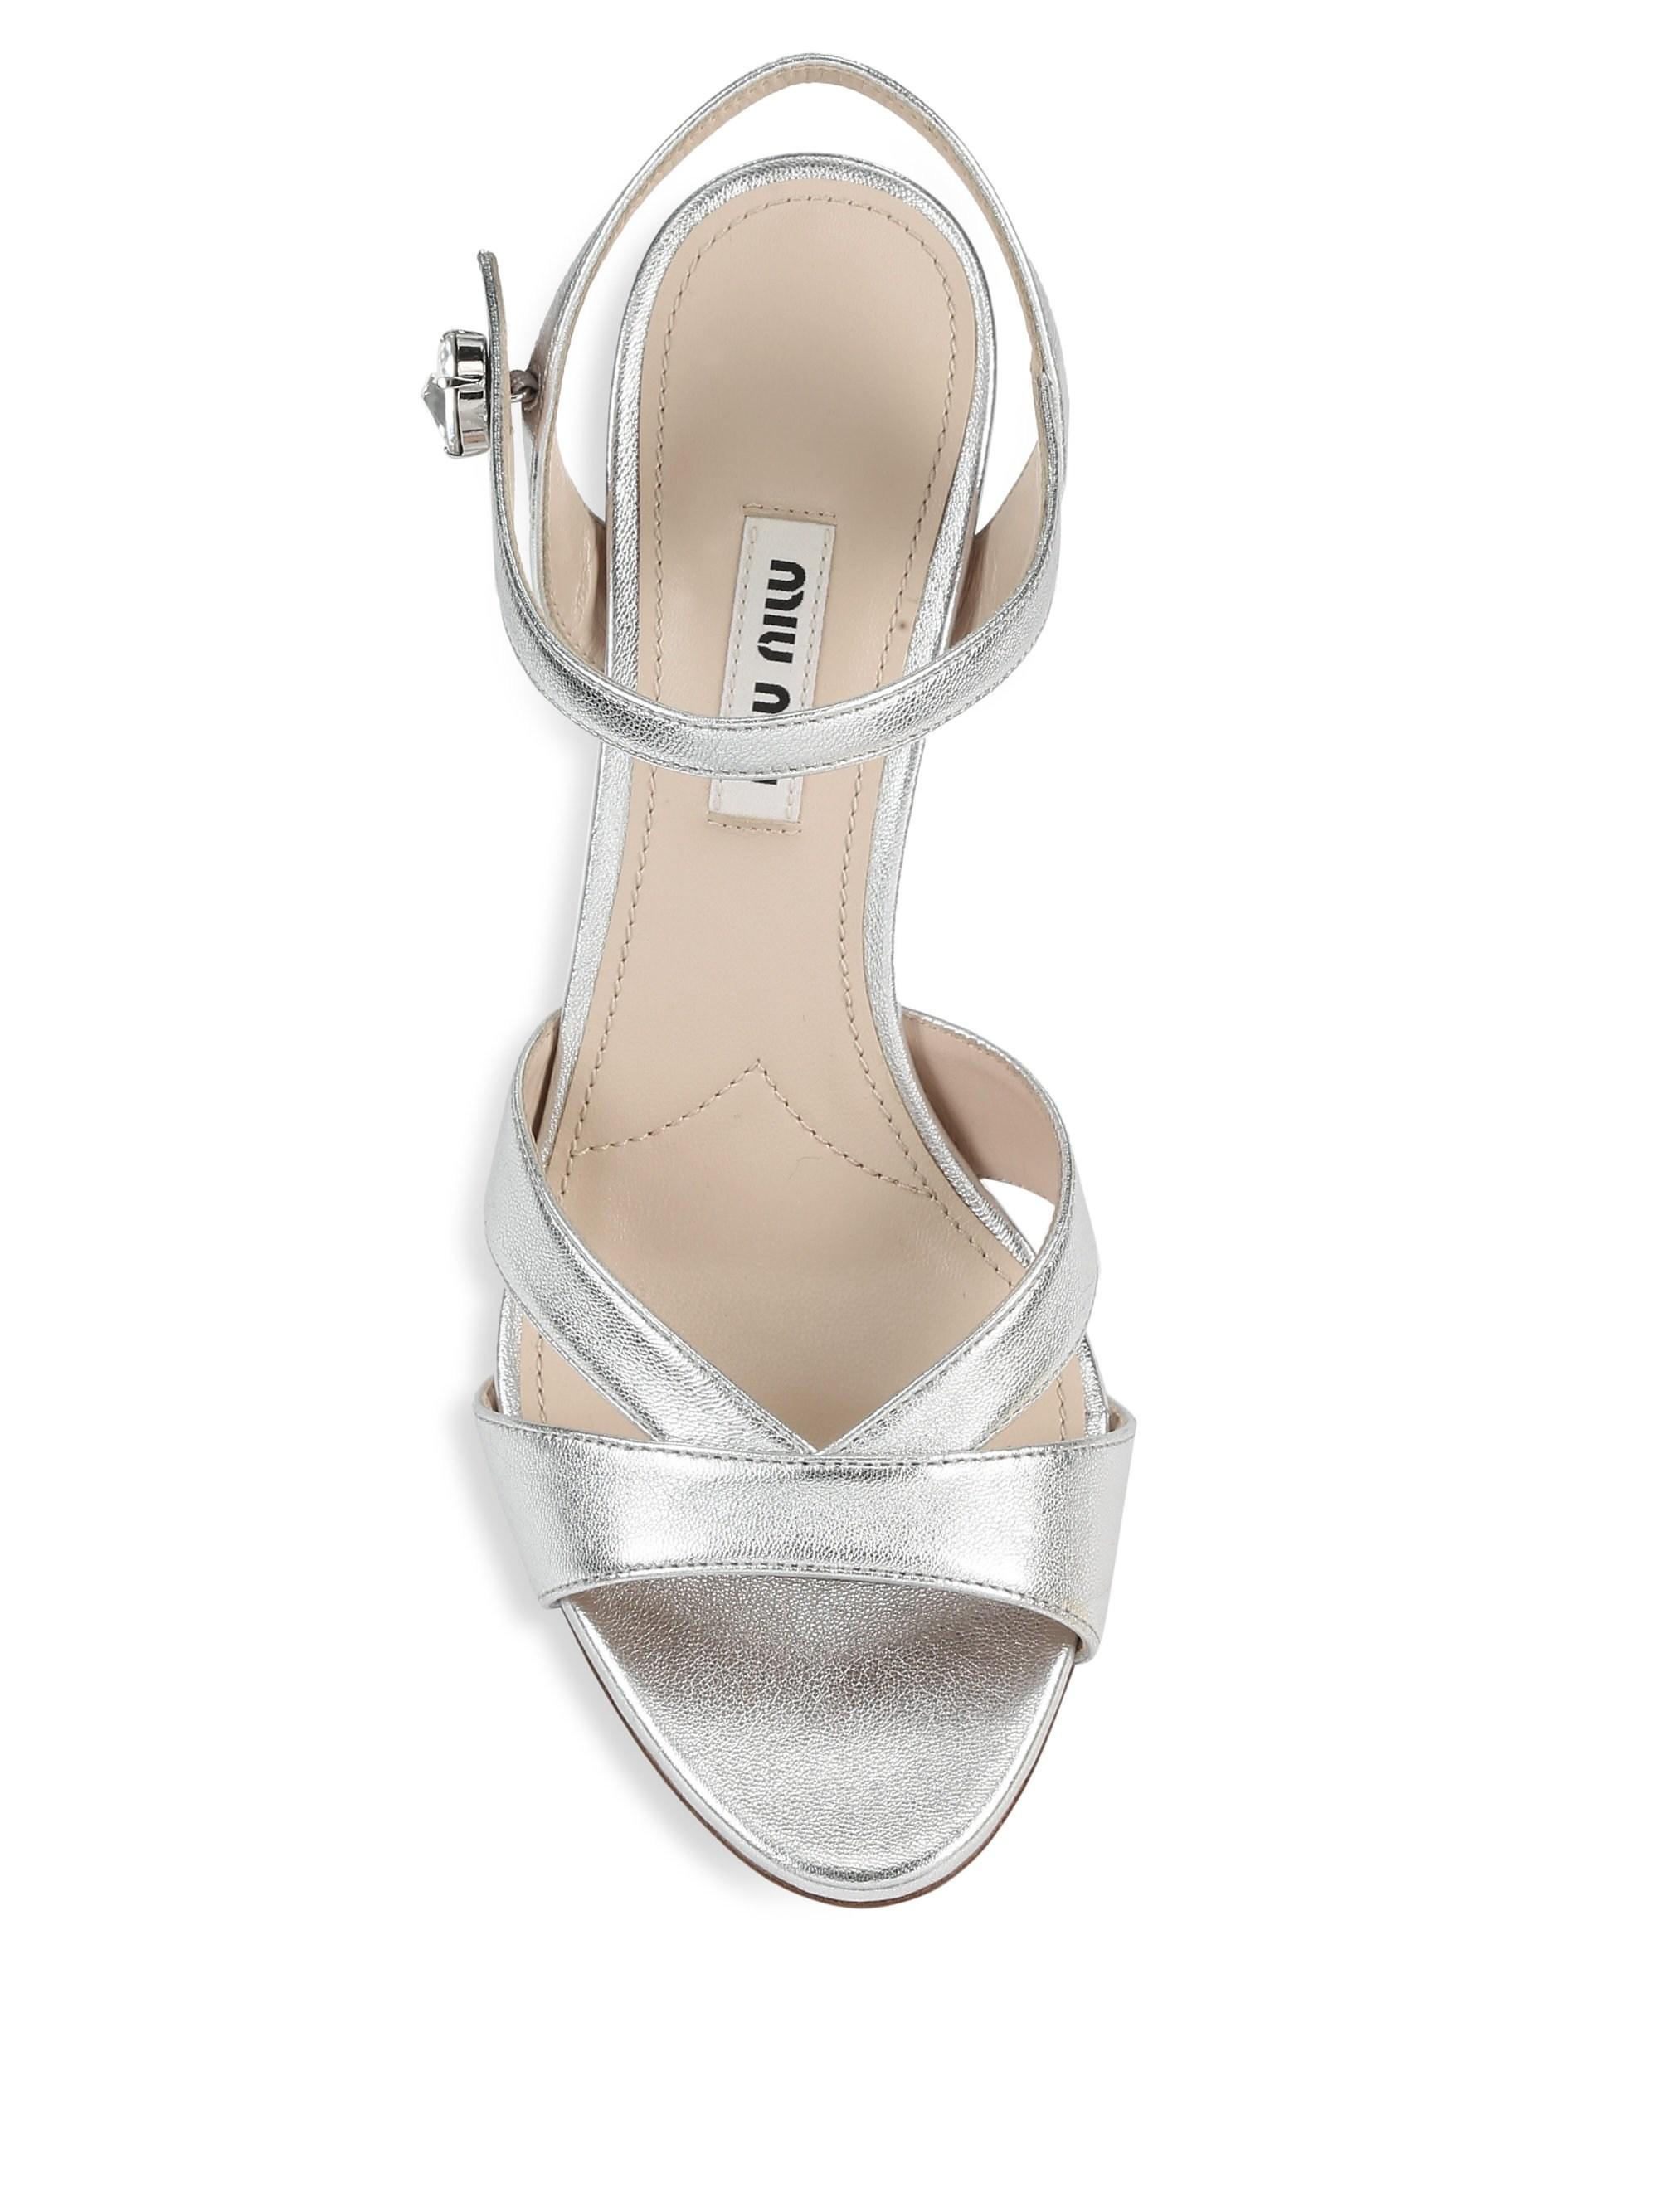 c535770b65db Lyst - Miu Miu Women s Metallic Leather Block Heel Sandals - Silver - Size  41.5 (11.5) in Metallic